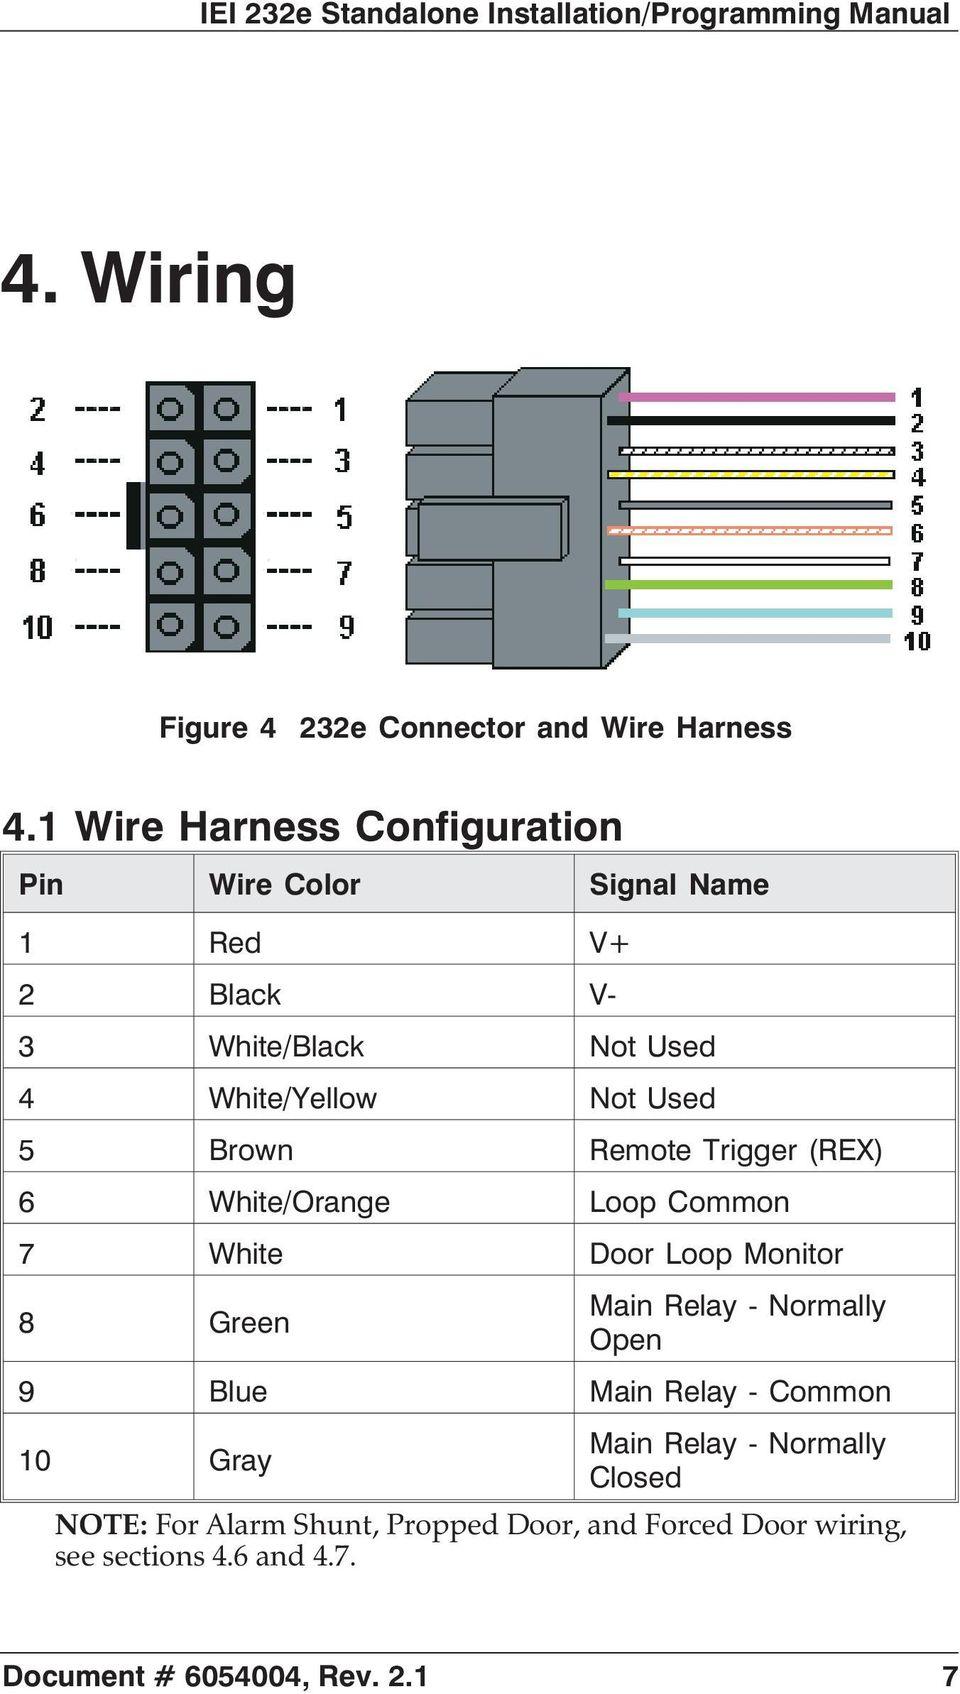 medium resolution of iei 232e standalone tm keypad installation programming manual pdf rh docplayer net iei 212se programming manual